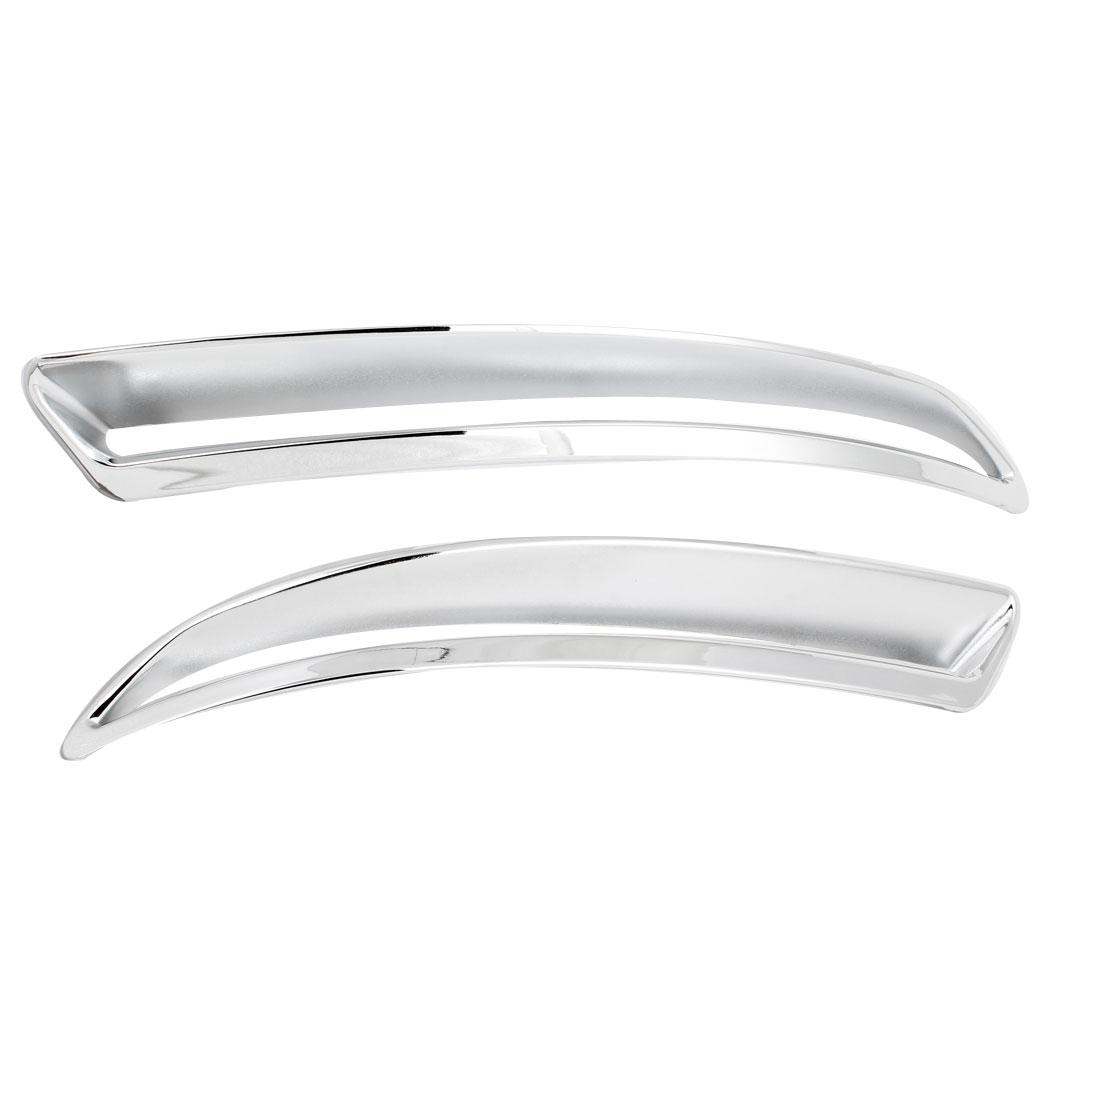 2 Pcs Silver Tone Car Chrome Rear Fog Light Cover Trims for VW Tiguan 2009-2011